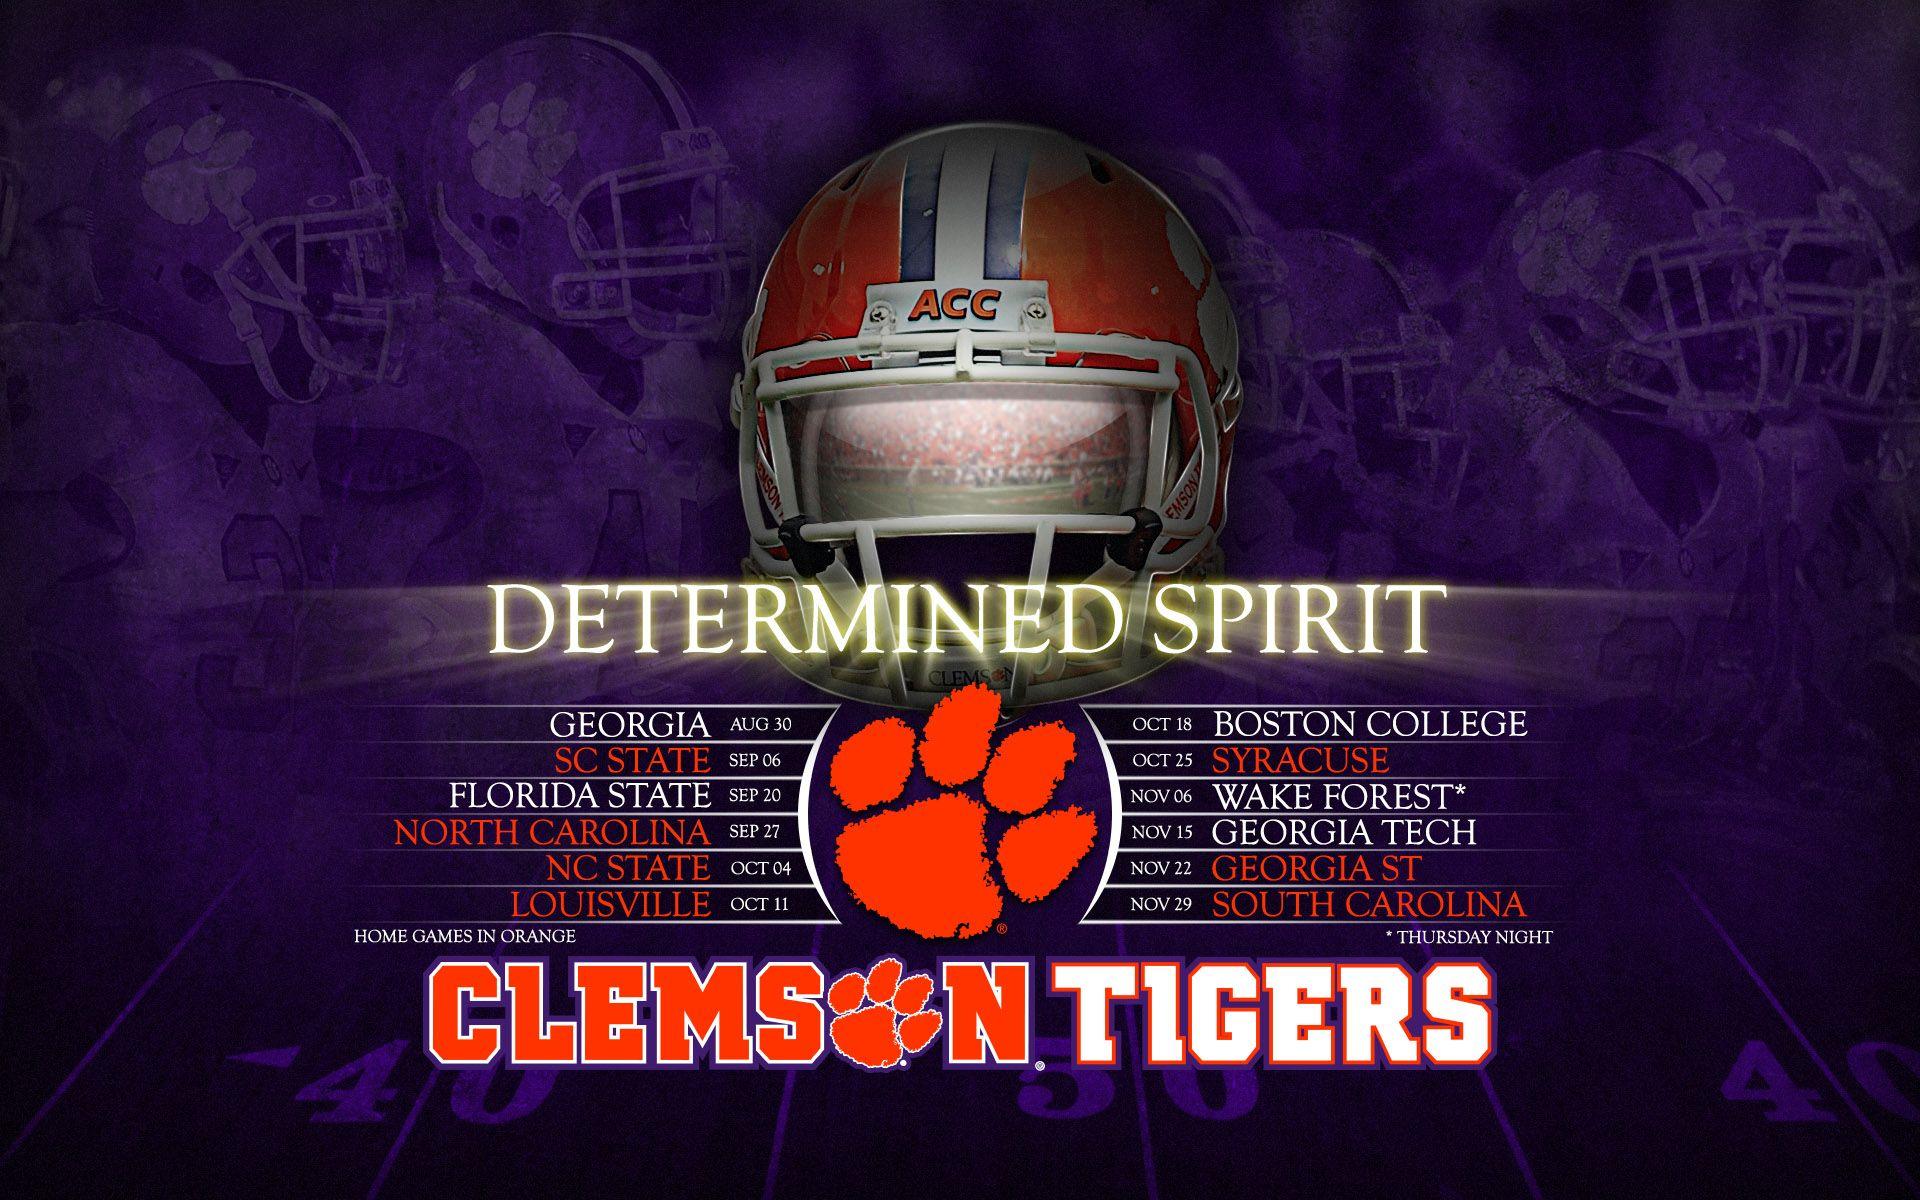 Clemson Tigers Football Schedule 2014 Clemson tigers